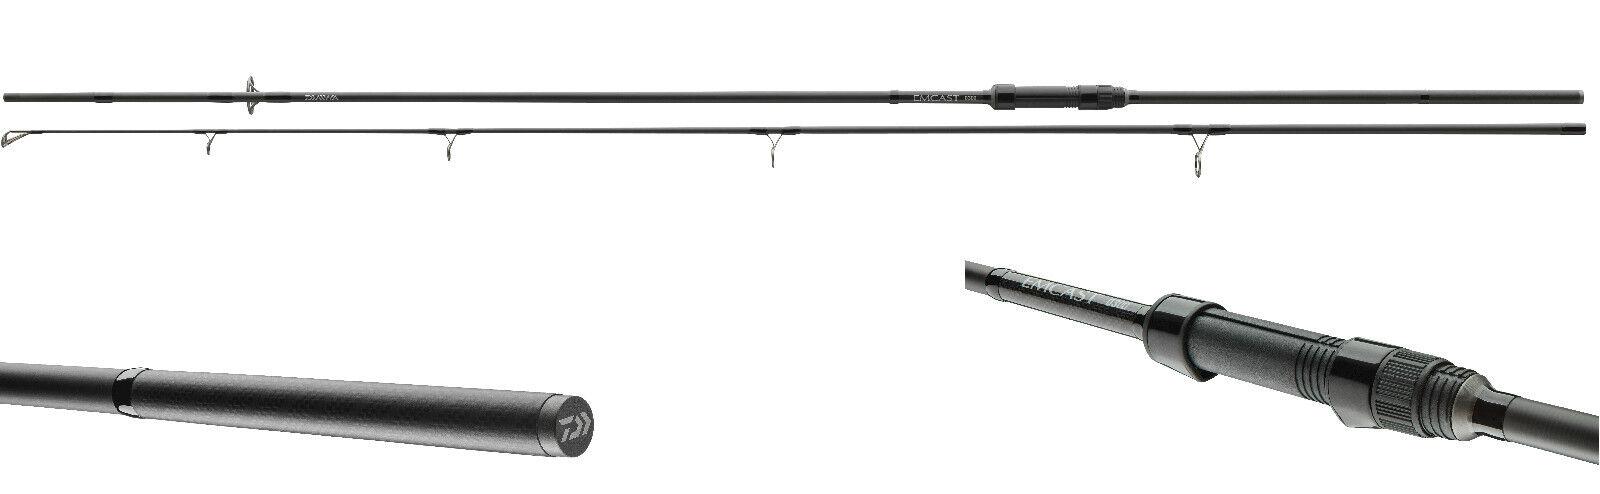 Daiwa Emcast Carp 3,60m 3,60m 3,60m 3,0 lbs Karpfenrute 2-teilig Karpfenangel Karpfen Rute b0986f